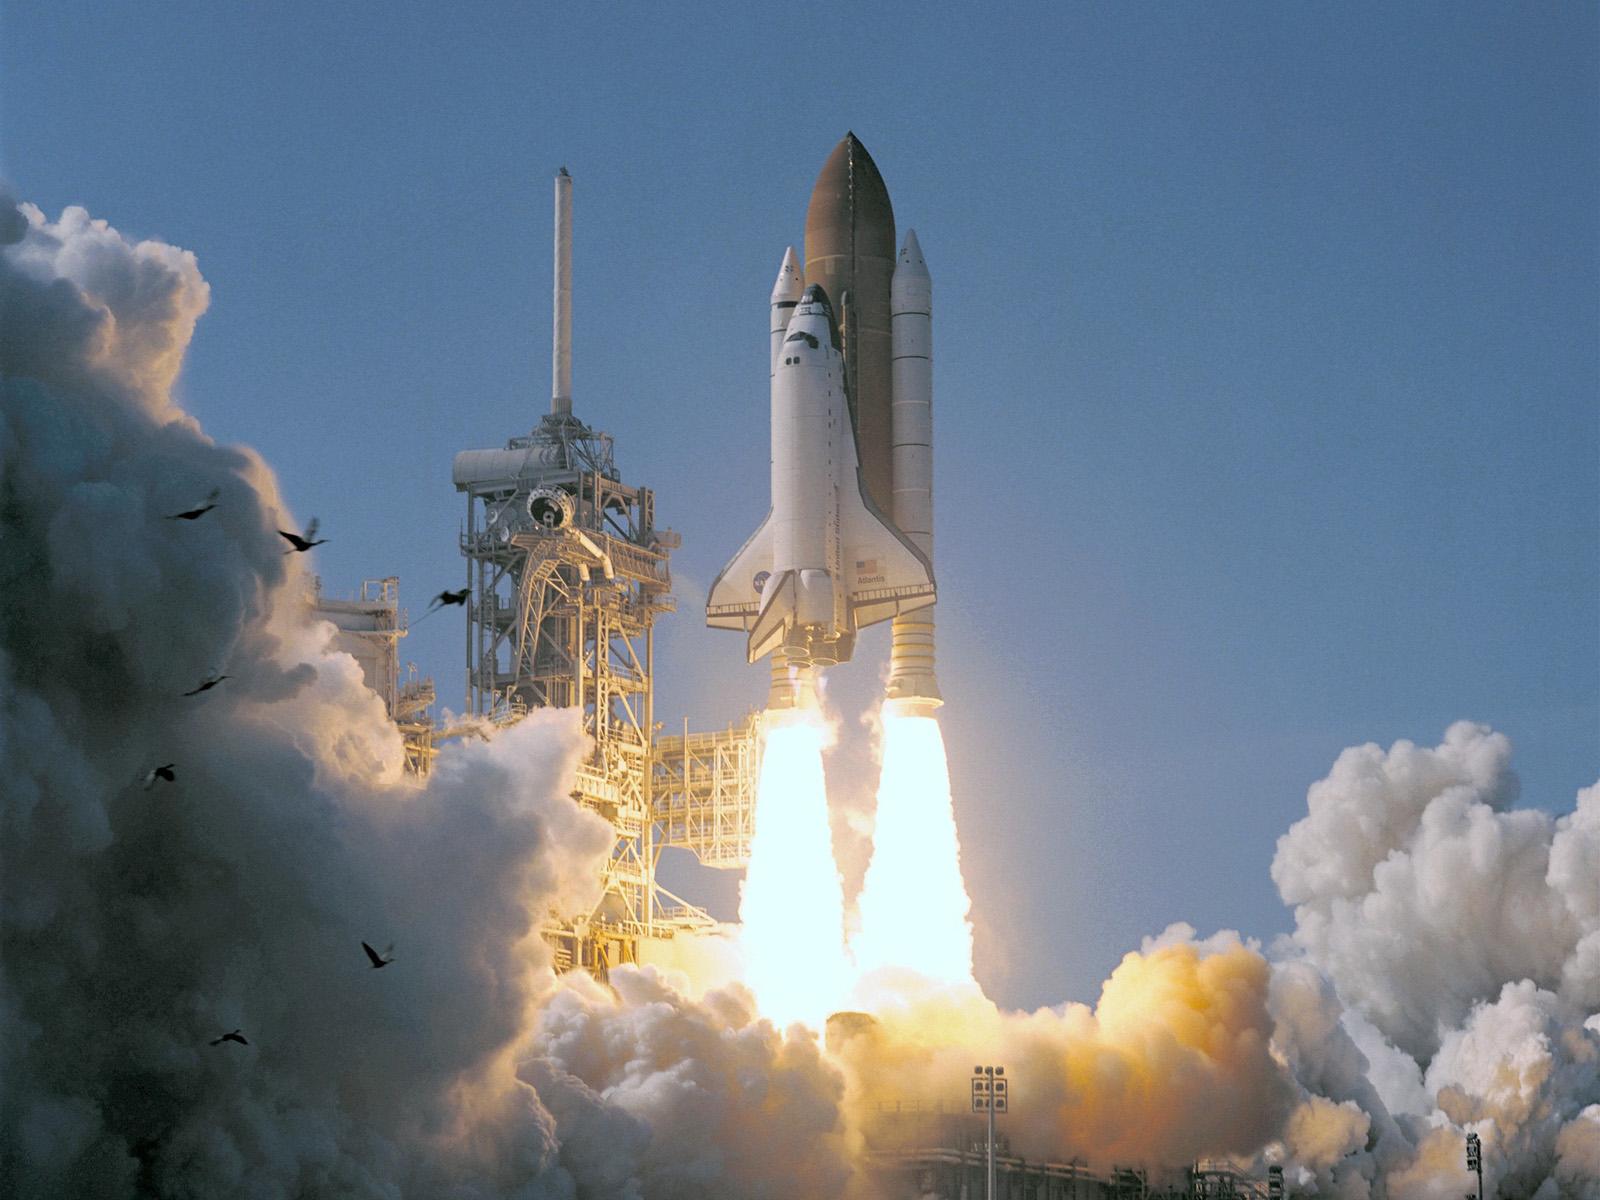 space shuttle space shuttle space shuttle space shuttle space shuttle 1600x1200